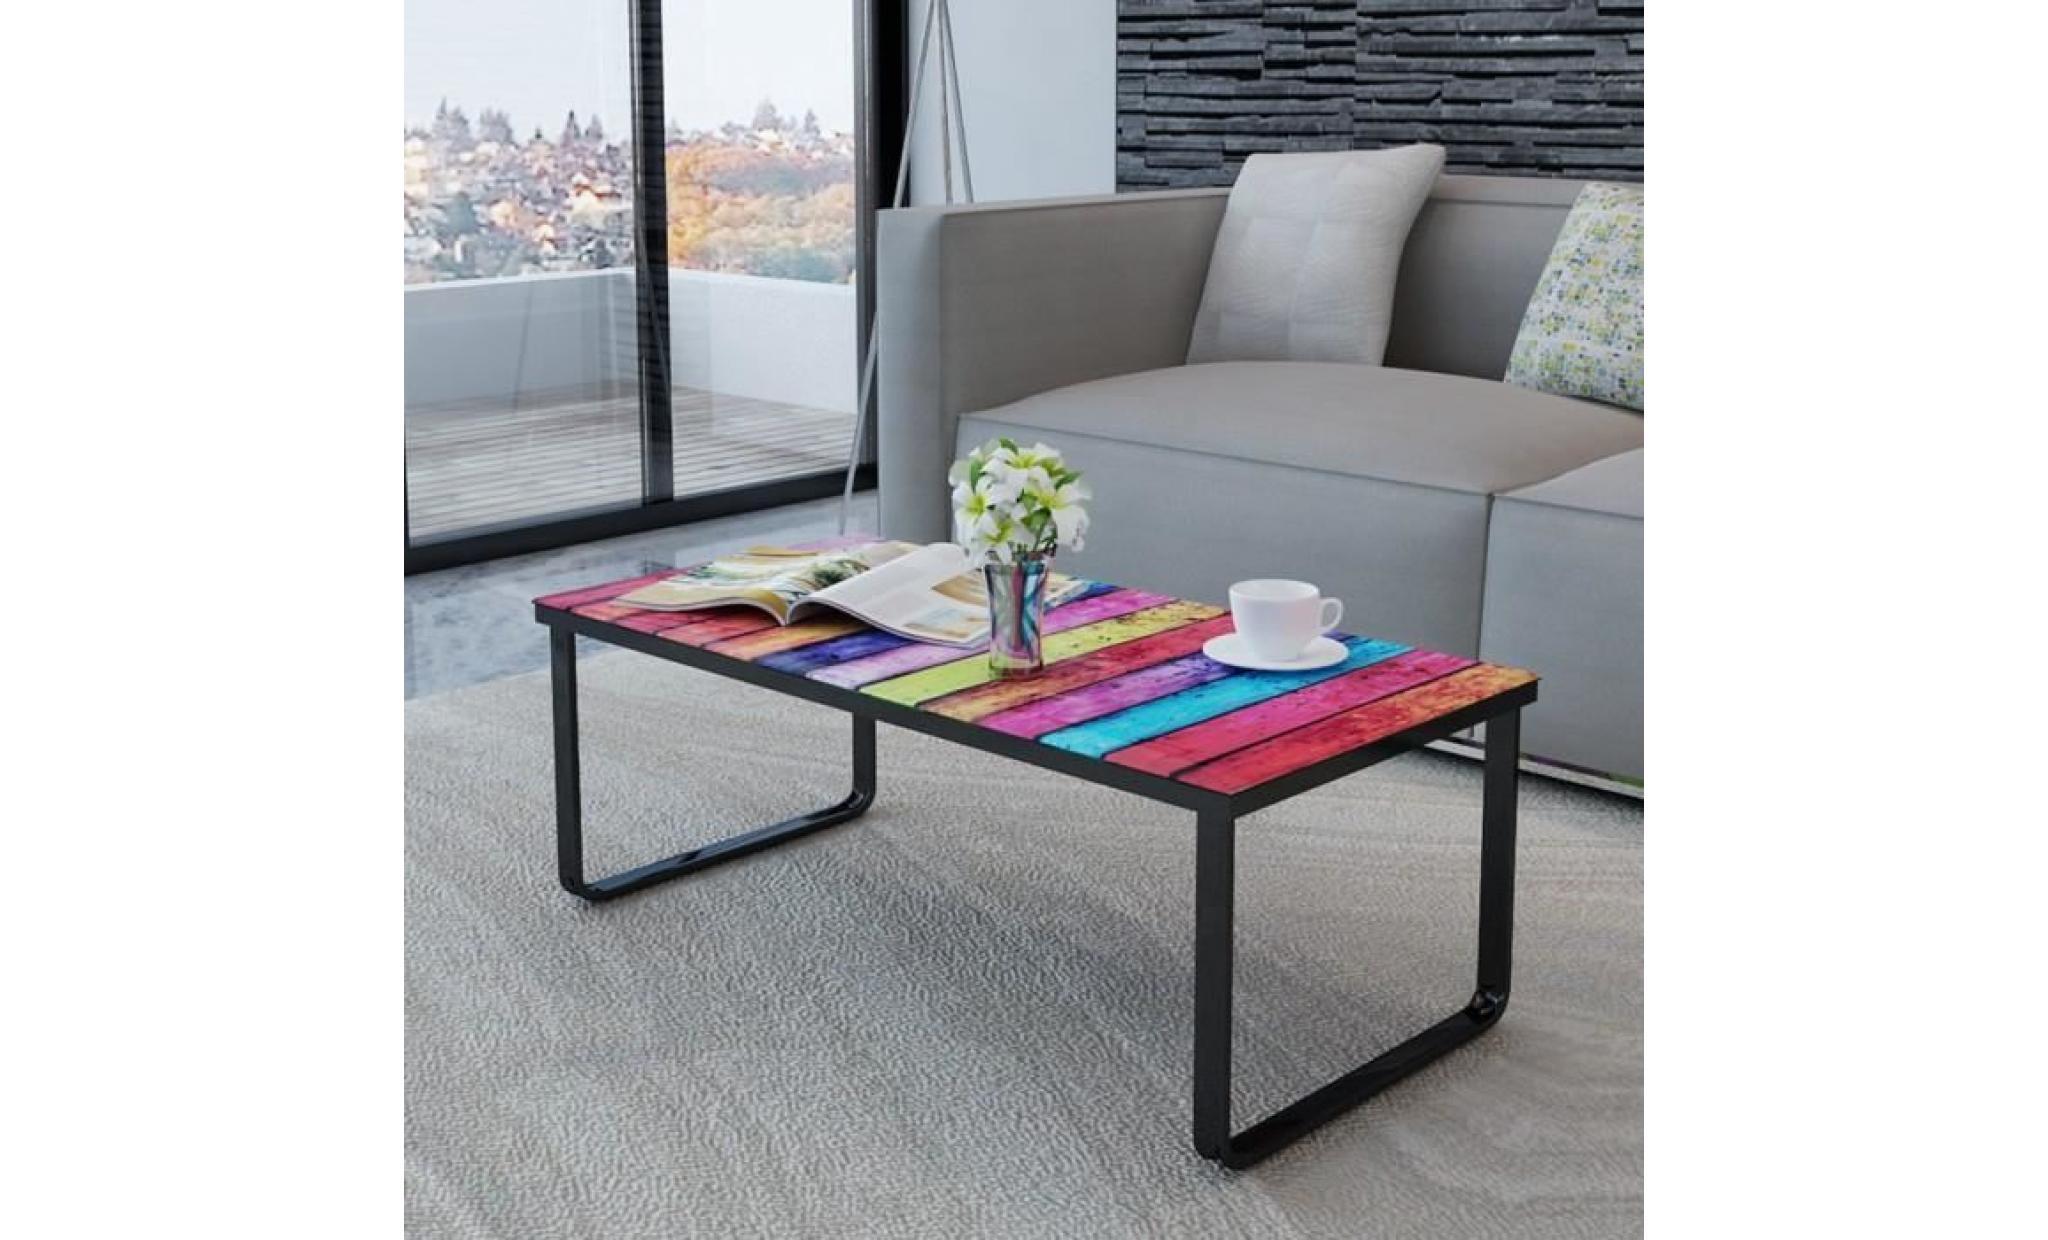 Tables Basses Ciel Verre Arc Table Basse En Design Nvn0wm8